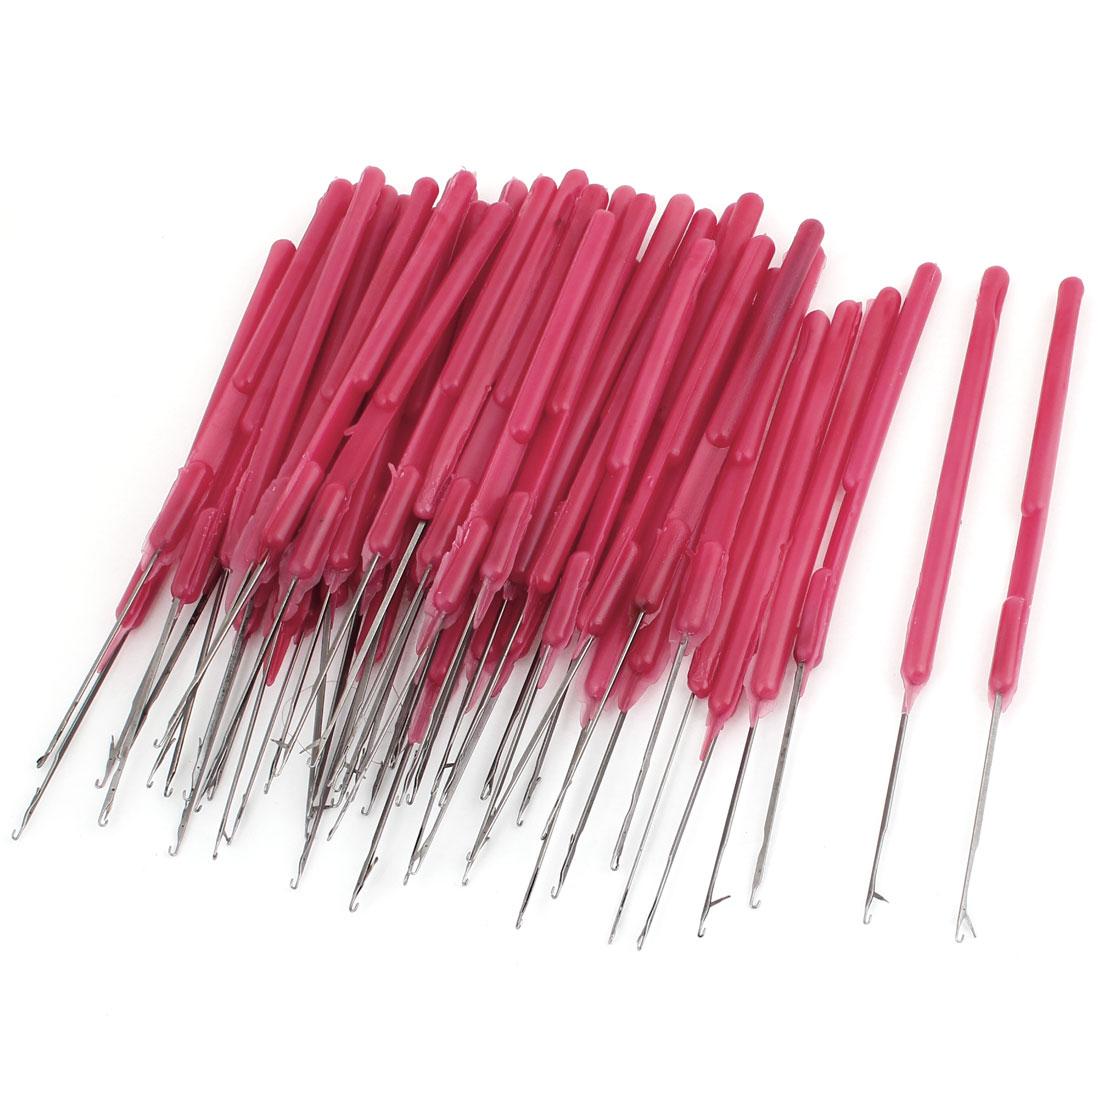 Plastic Silver Tone Red Handgrip Crochet Hook Needles 50 Pcs